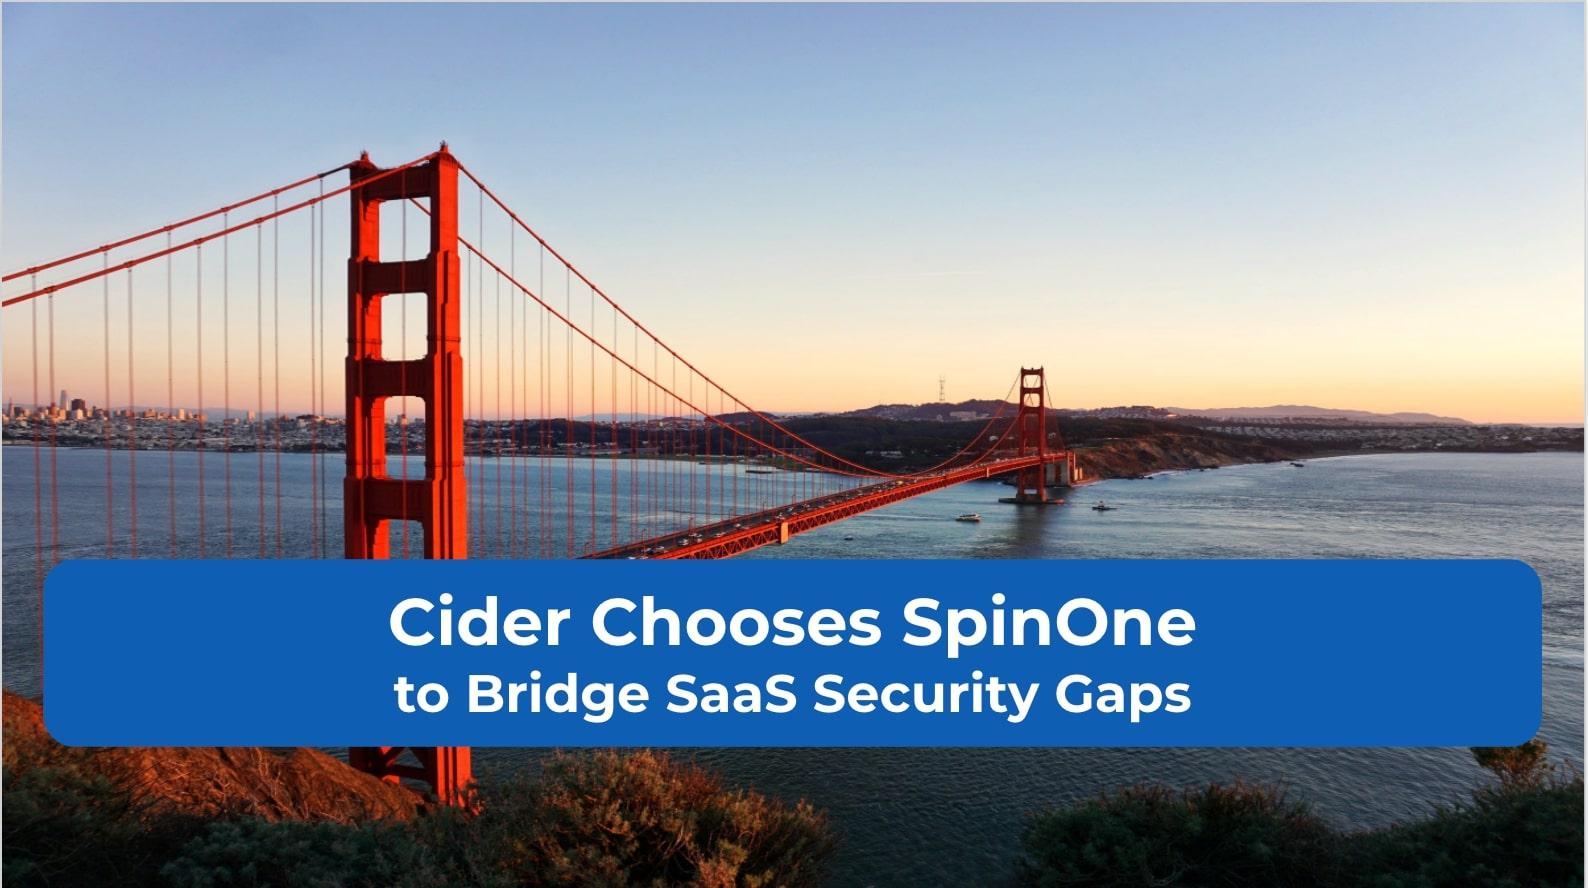 Cider Chooses SpinOne to Bridge SaaS Security Gaps